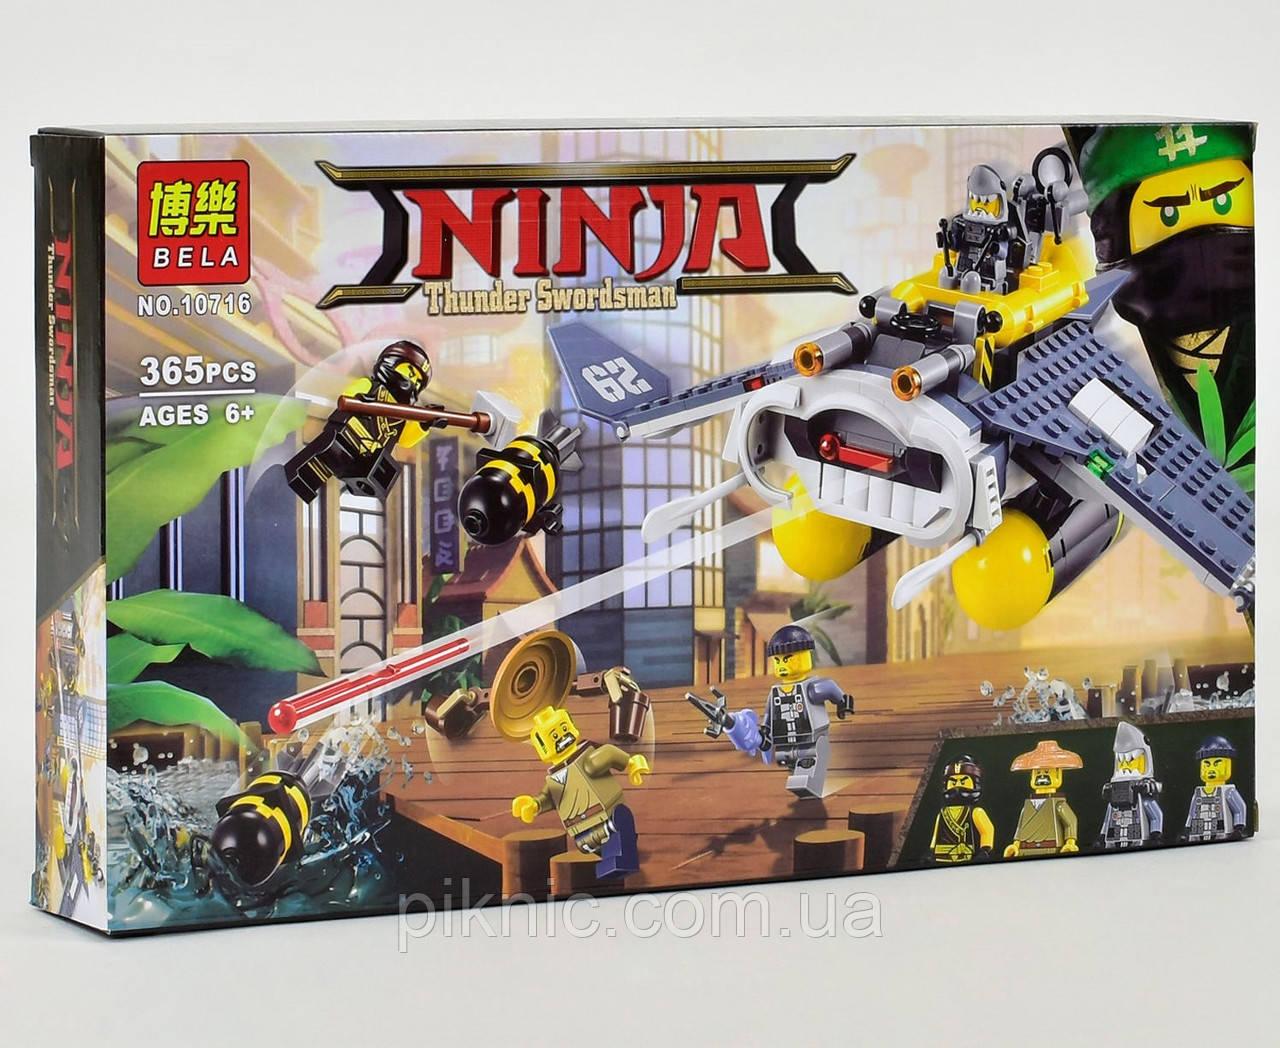 Конструктор Ниндзяго Летающий батискаф 365 деталей, Детский конструктор Ниндзя, Ниндзяго для мальчиков